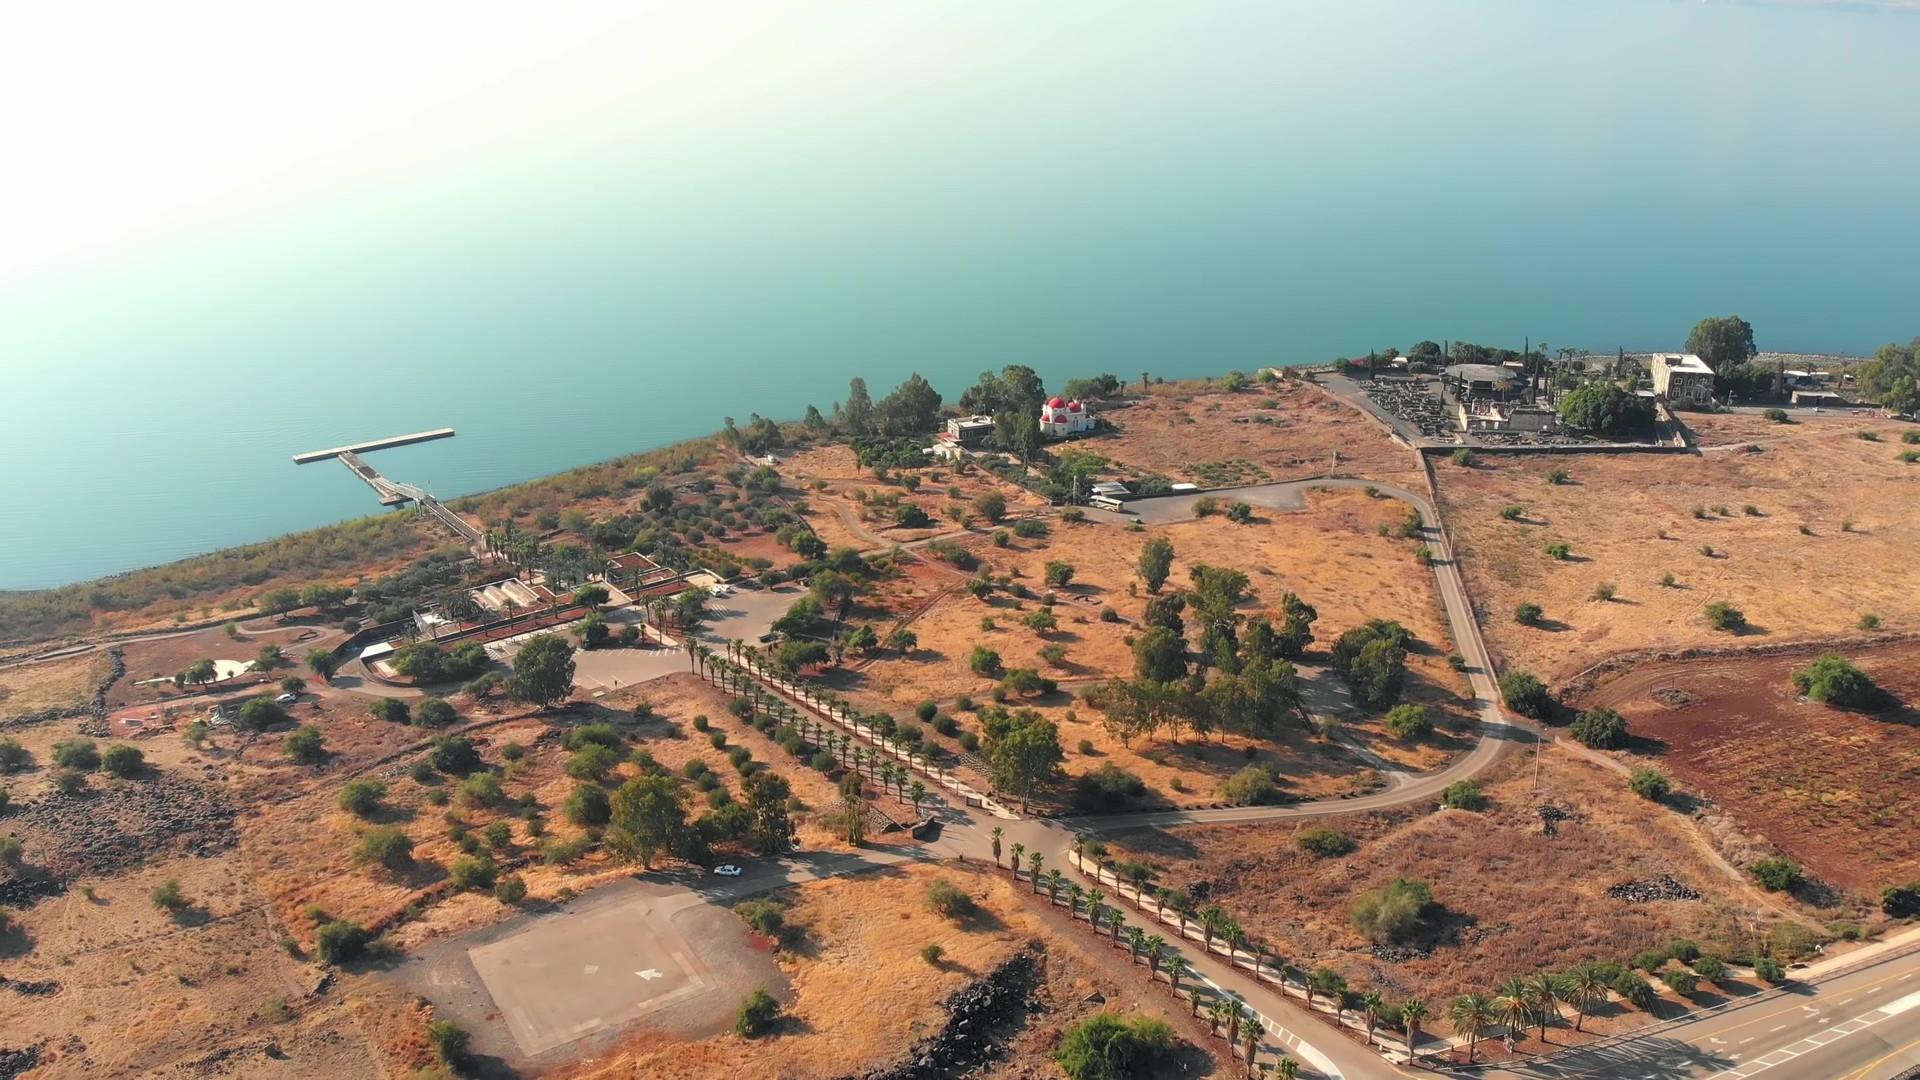 Capernaum, the town of Jesus_Moment3.jpg